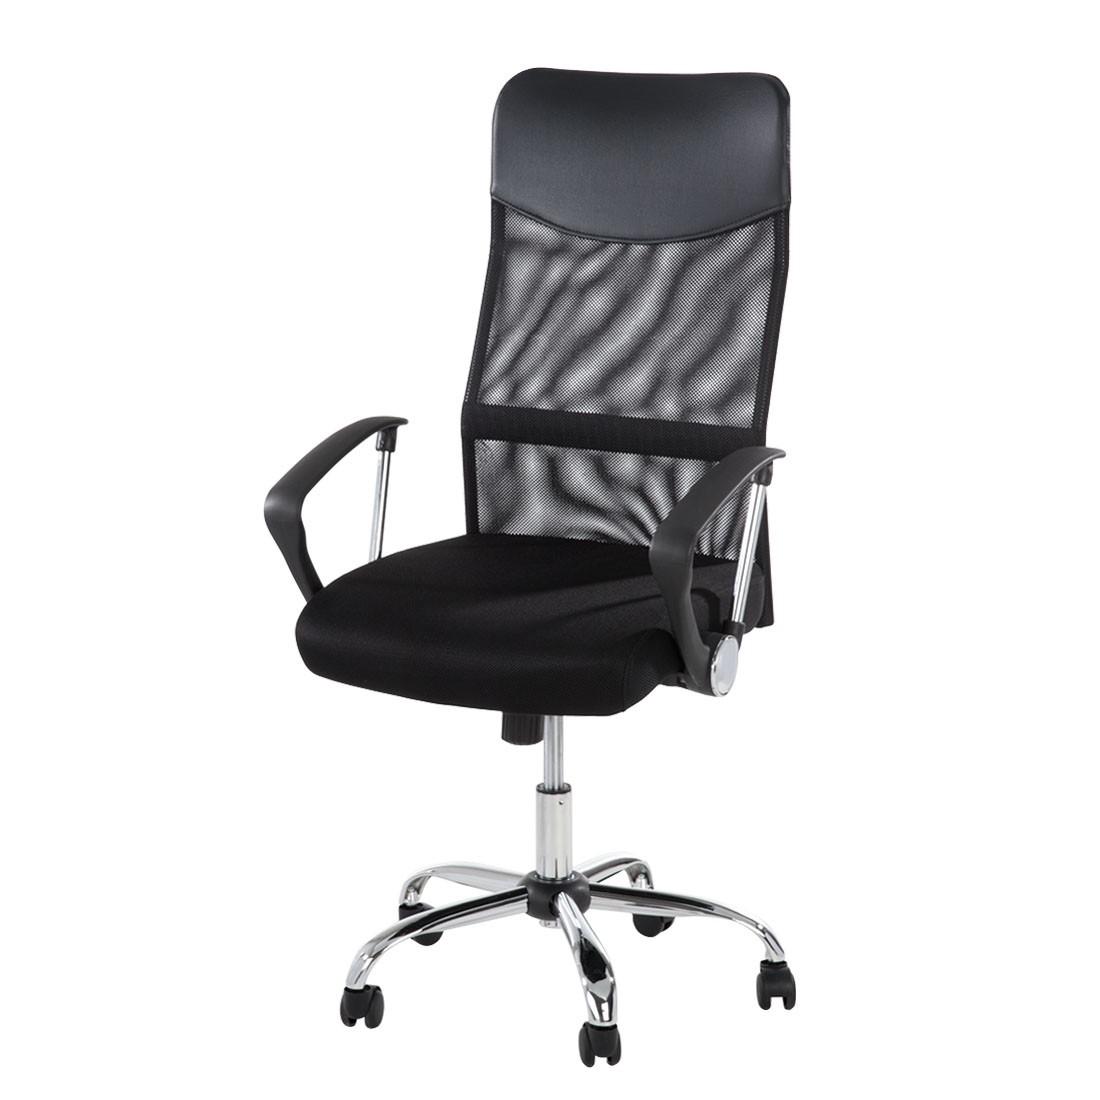 Bürodrehstuhl Matt – Textilbezug – Schwarz, home24office günstig kaufen